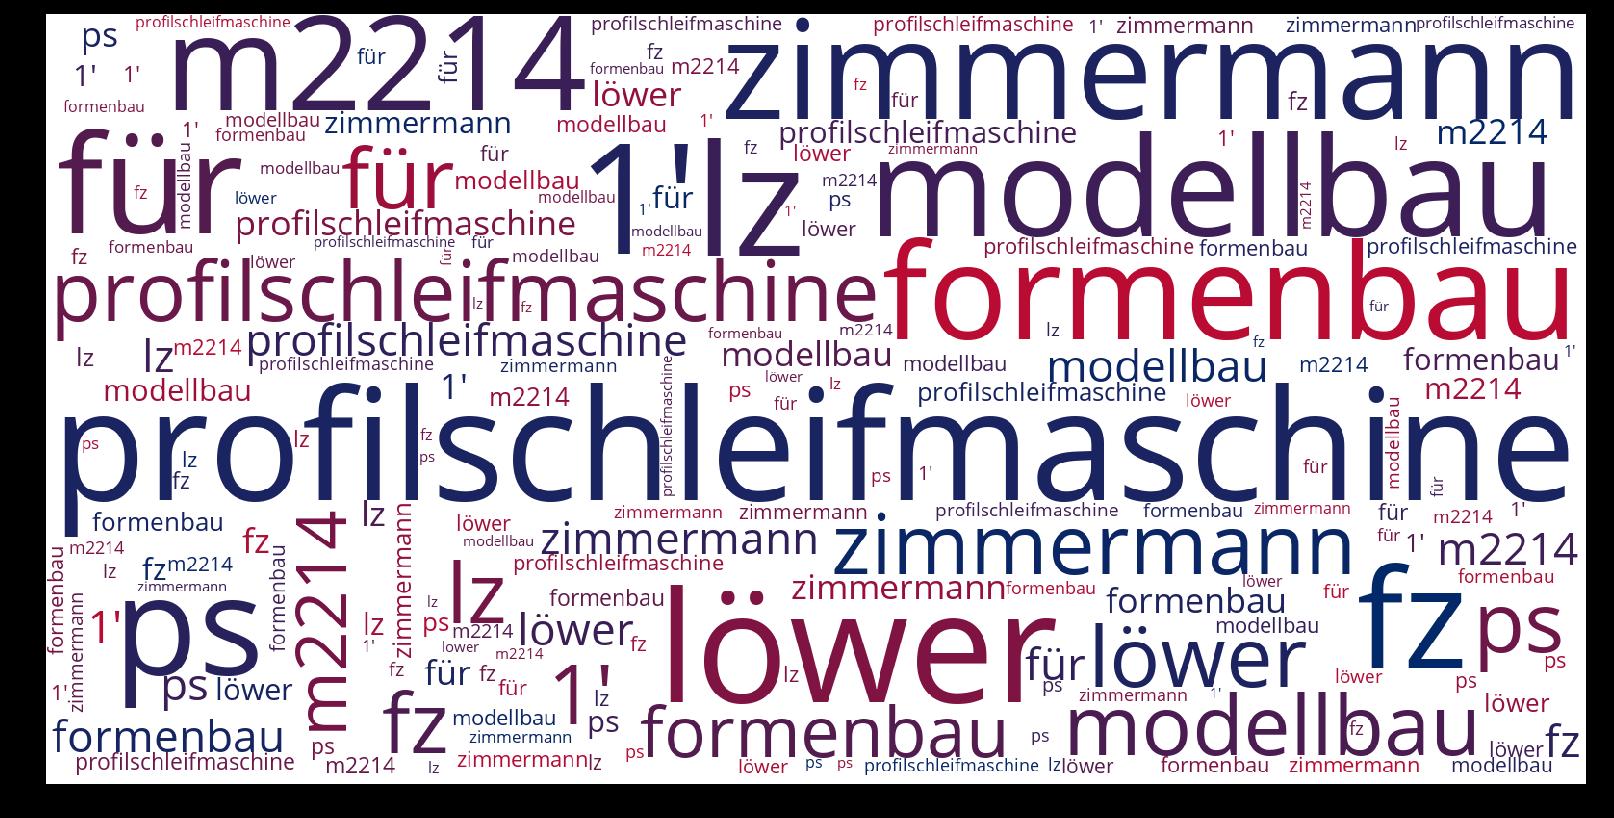 Profilschleifmaschine-wordcloud